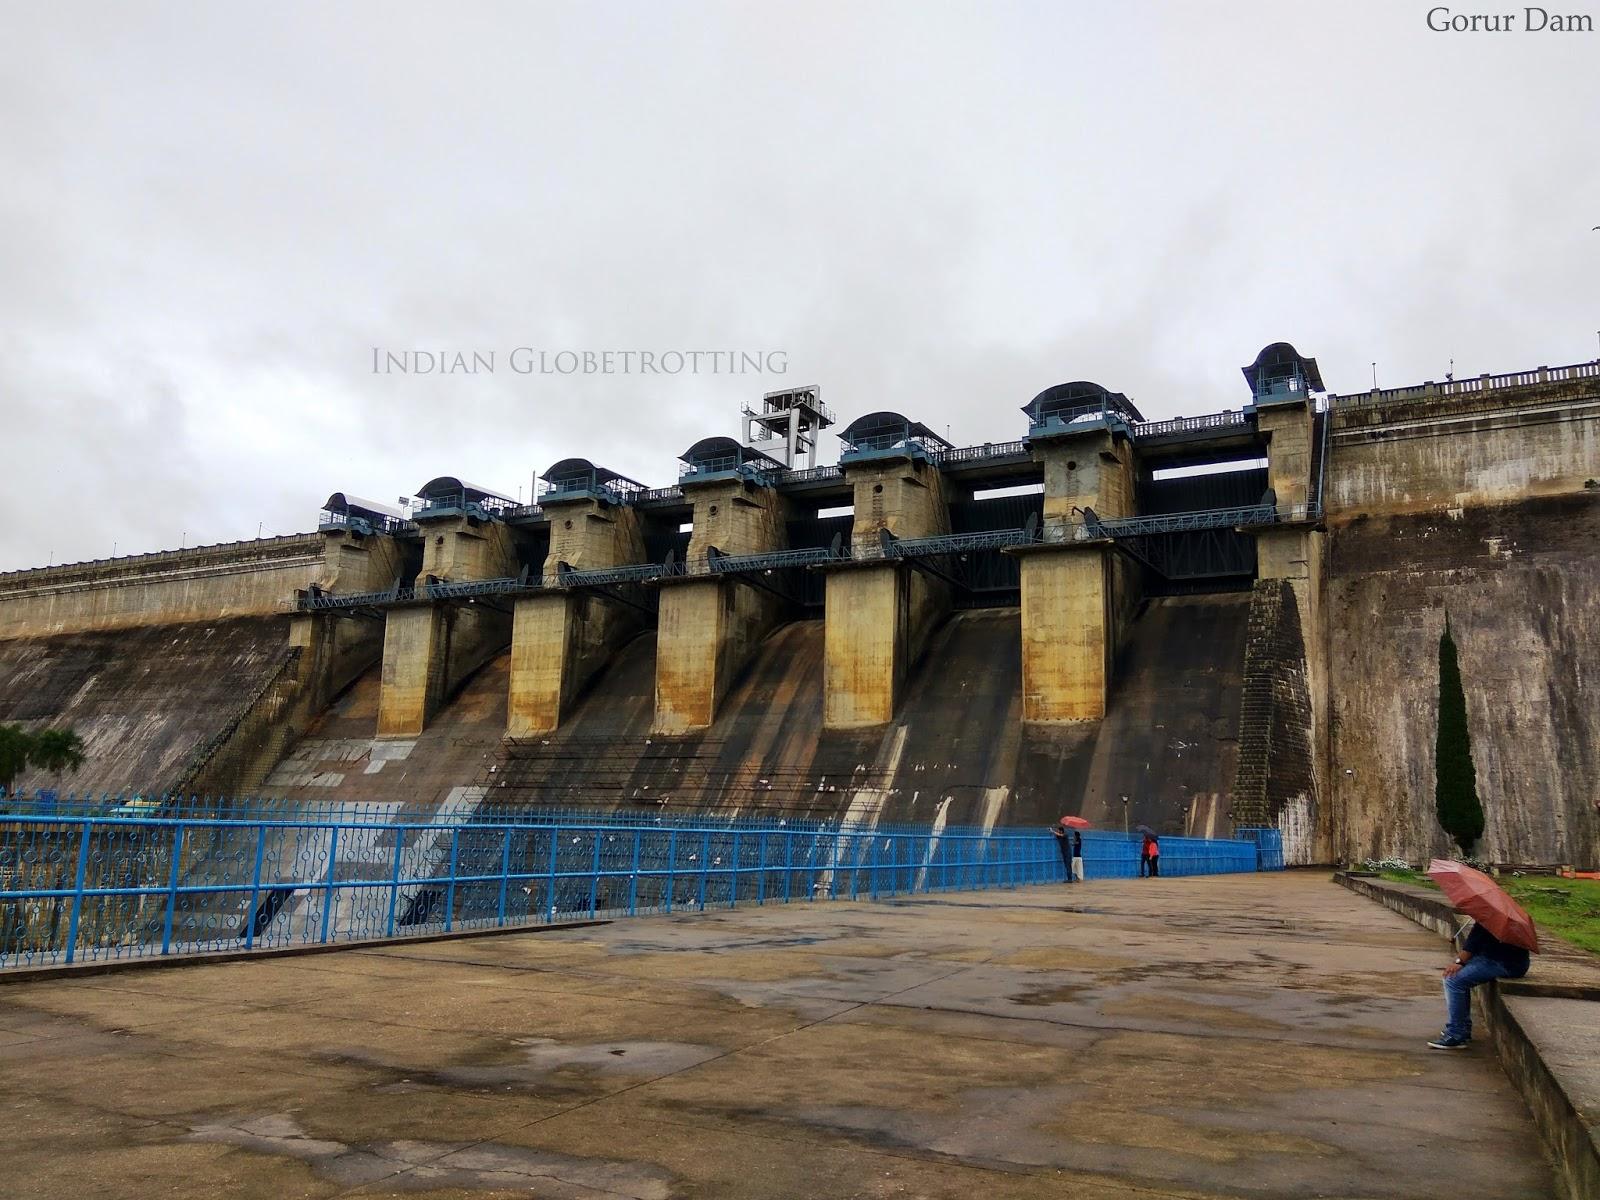 A view of Gorur Dam